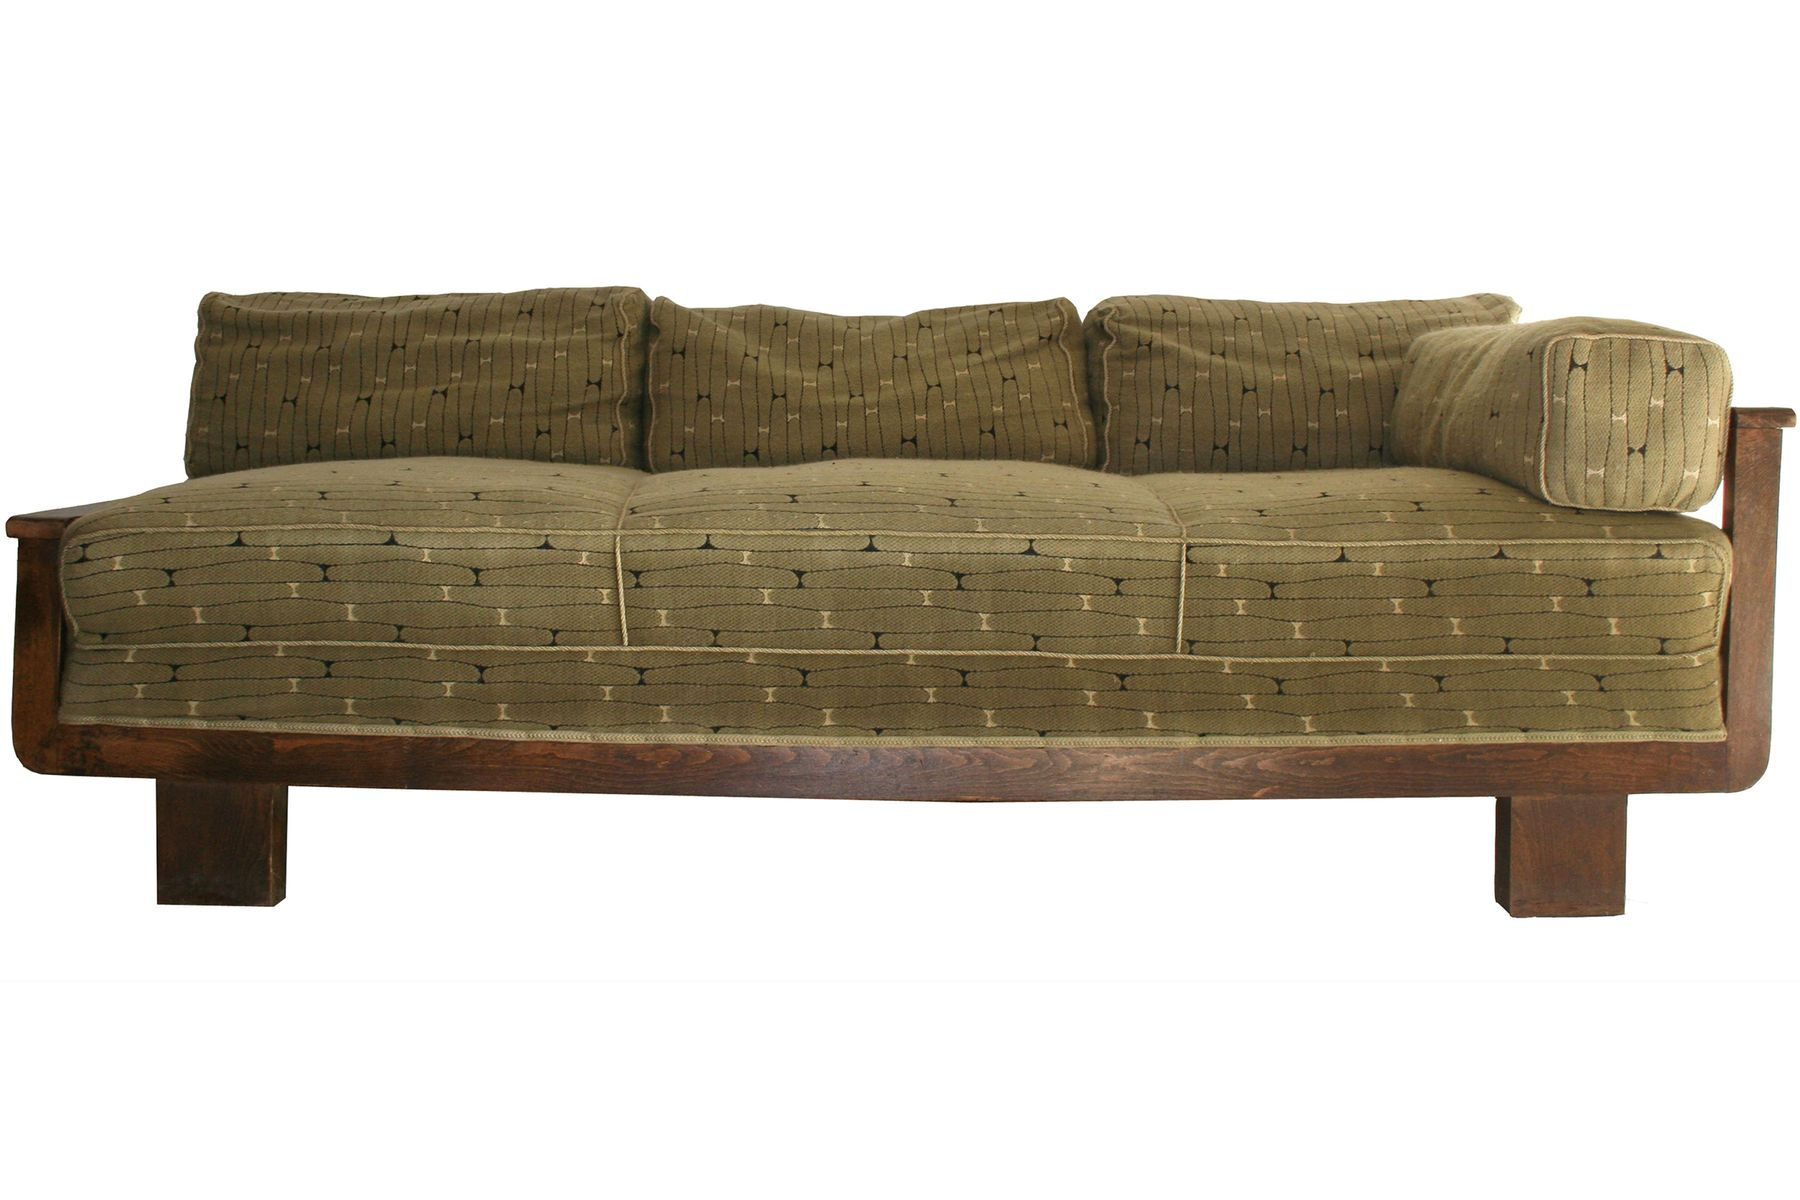 tschechisches mid century sofa aus dunklem holz 1950er. Black Bedroom Furniture Sets. Home Design Ideas